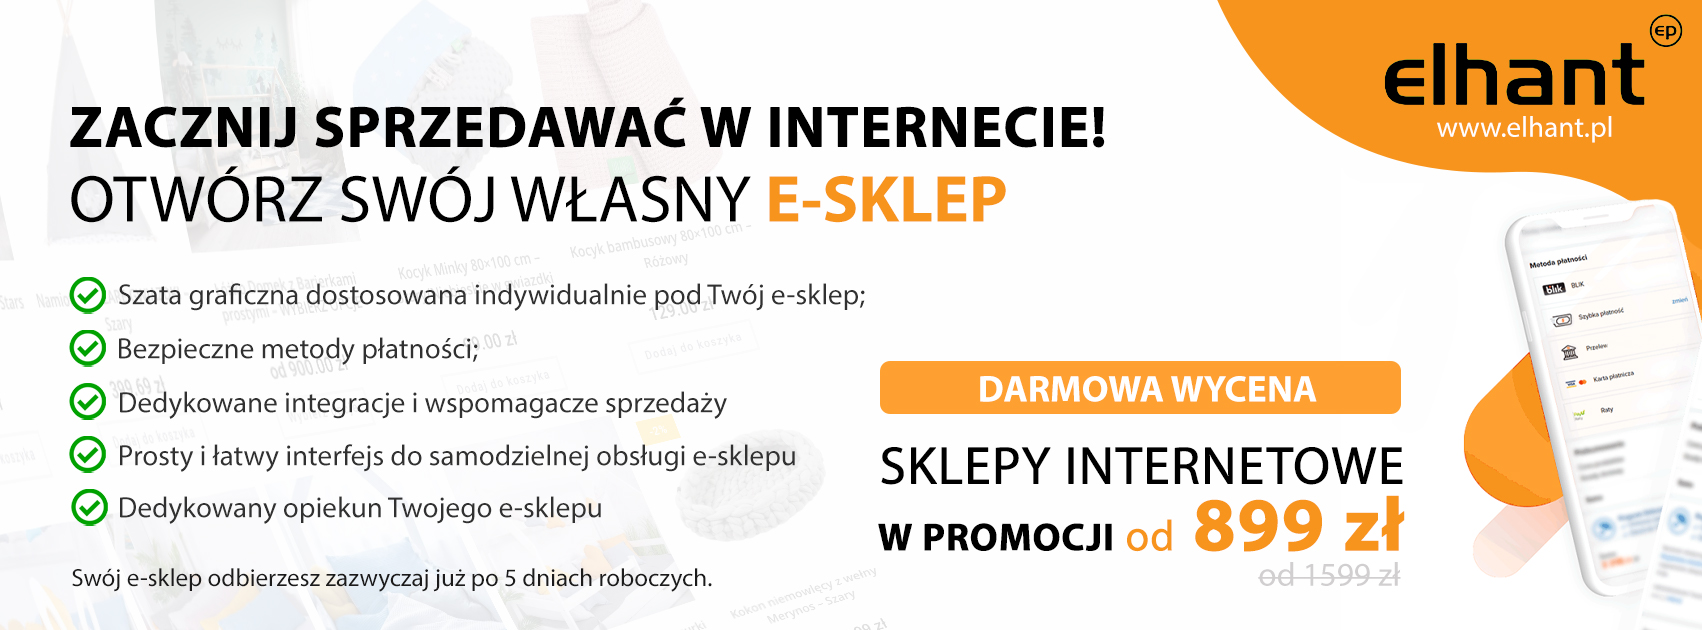 E-sklepy_reklama_BANER